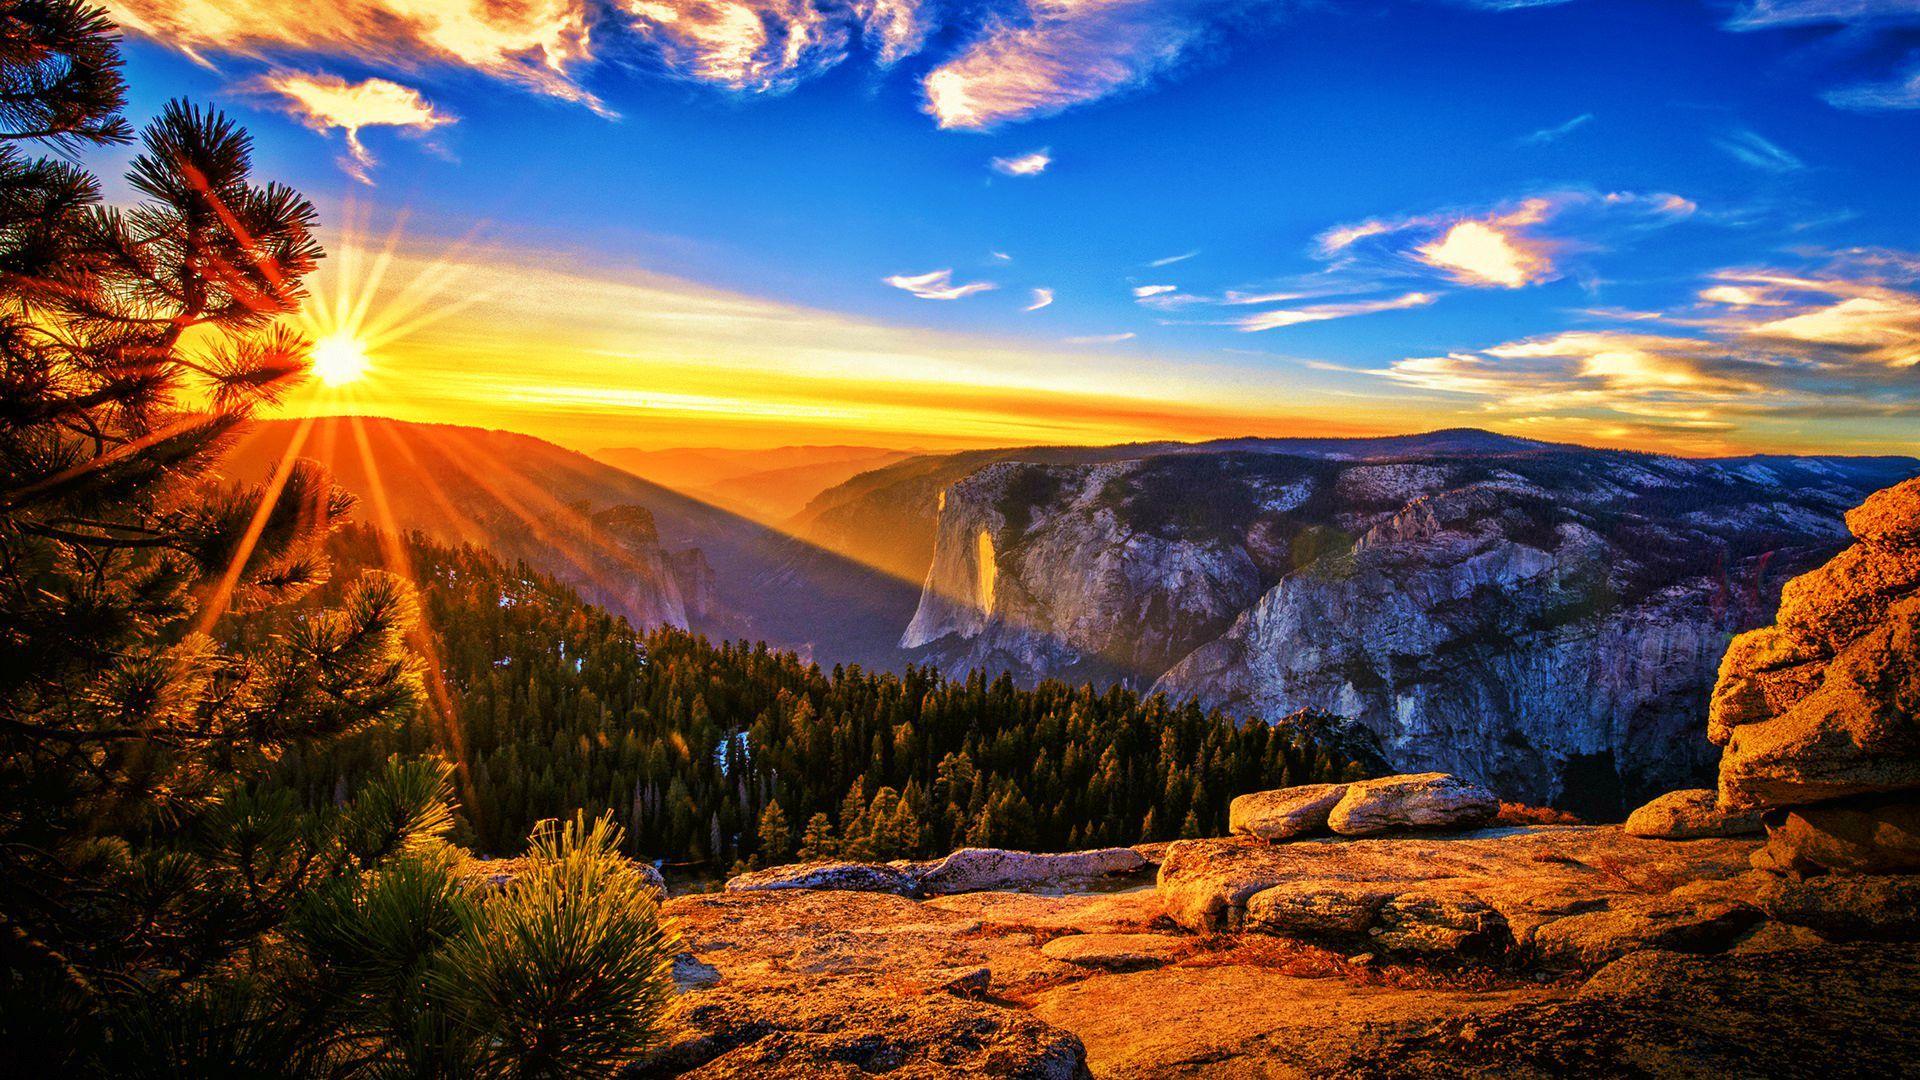 sun set scene | best wallpapers on your phone | pinterest | wallpaper